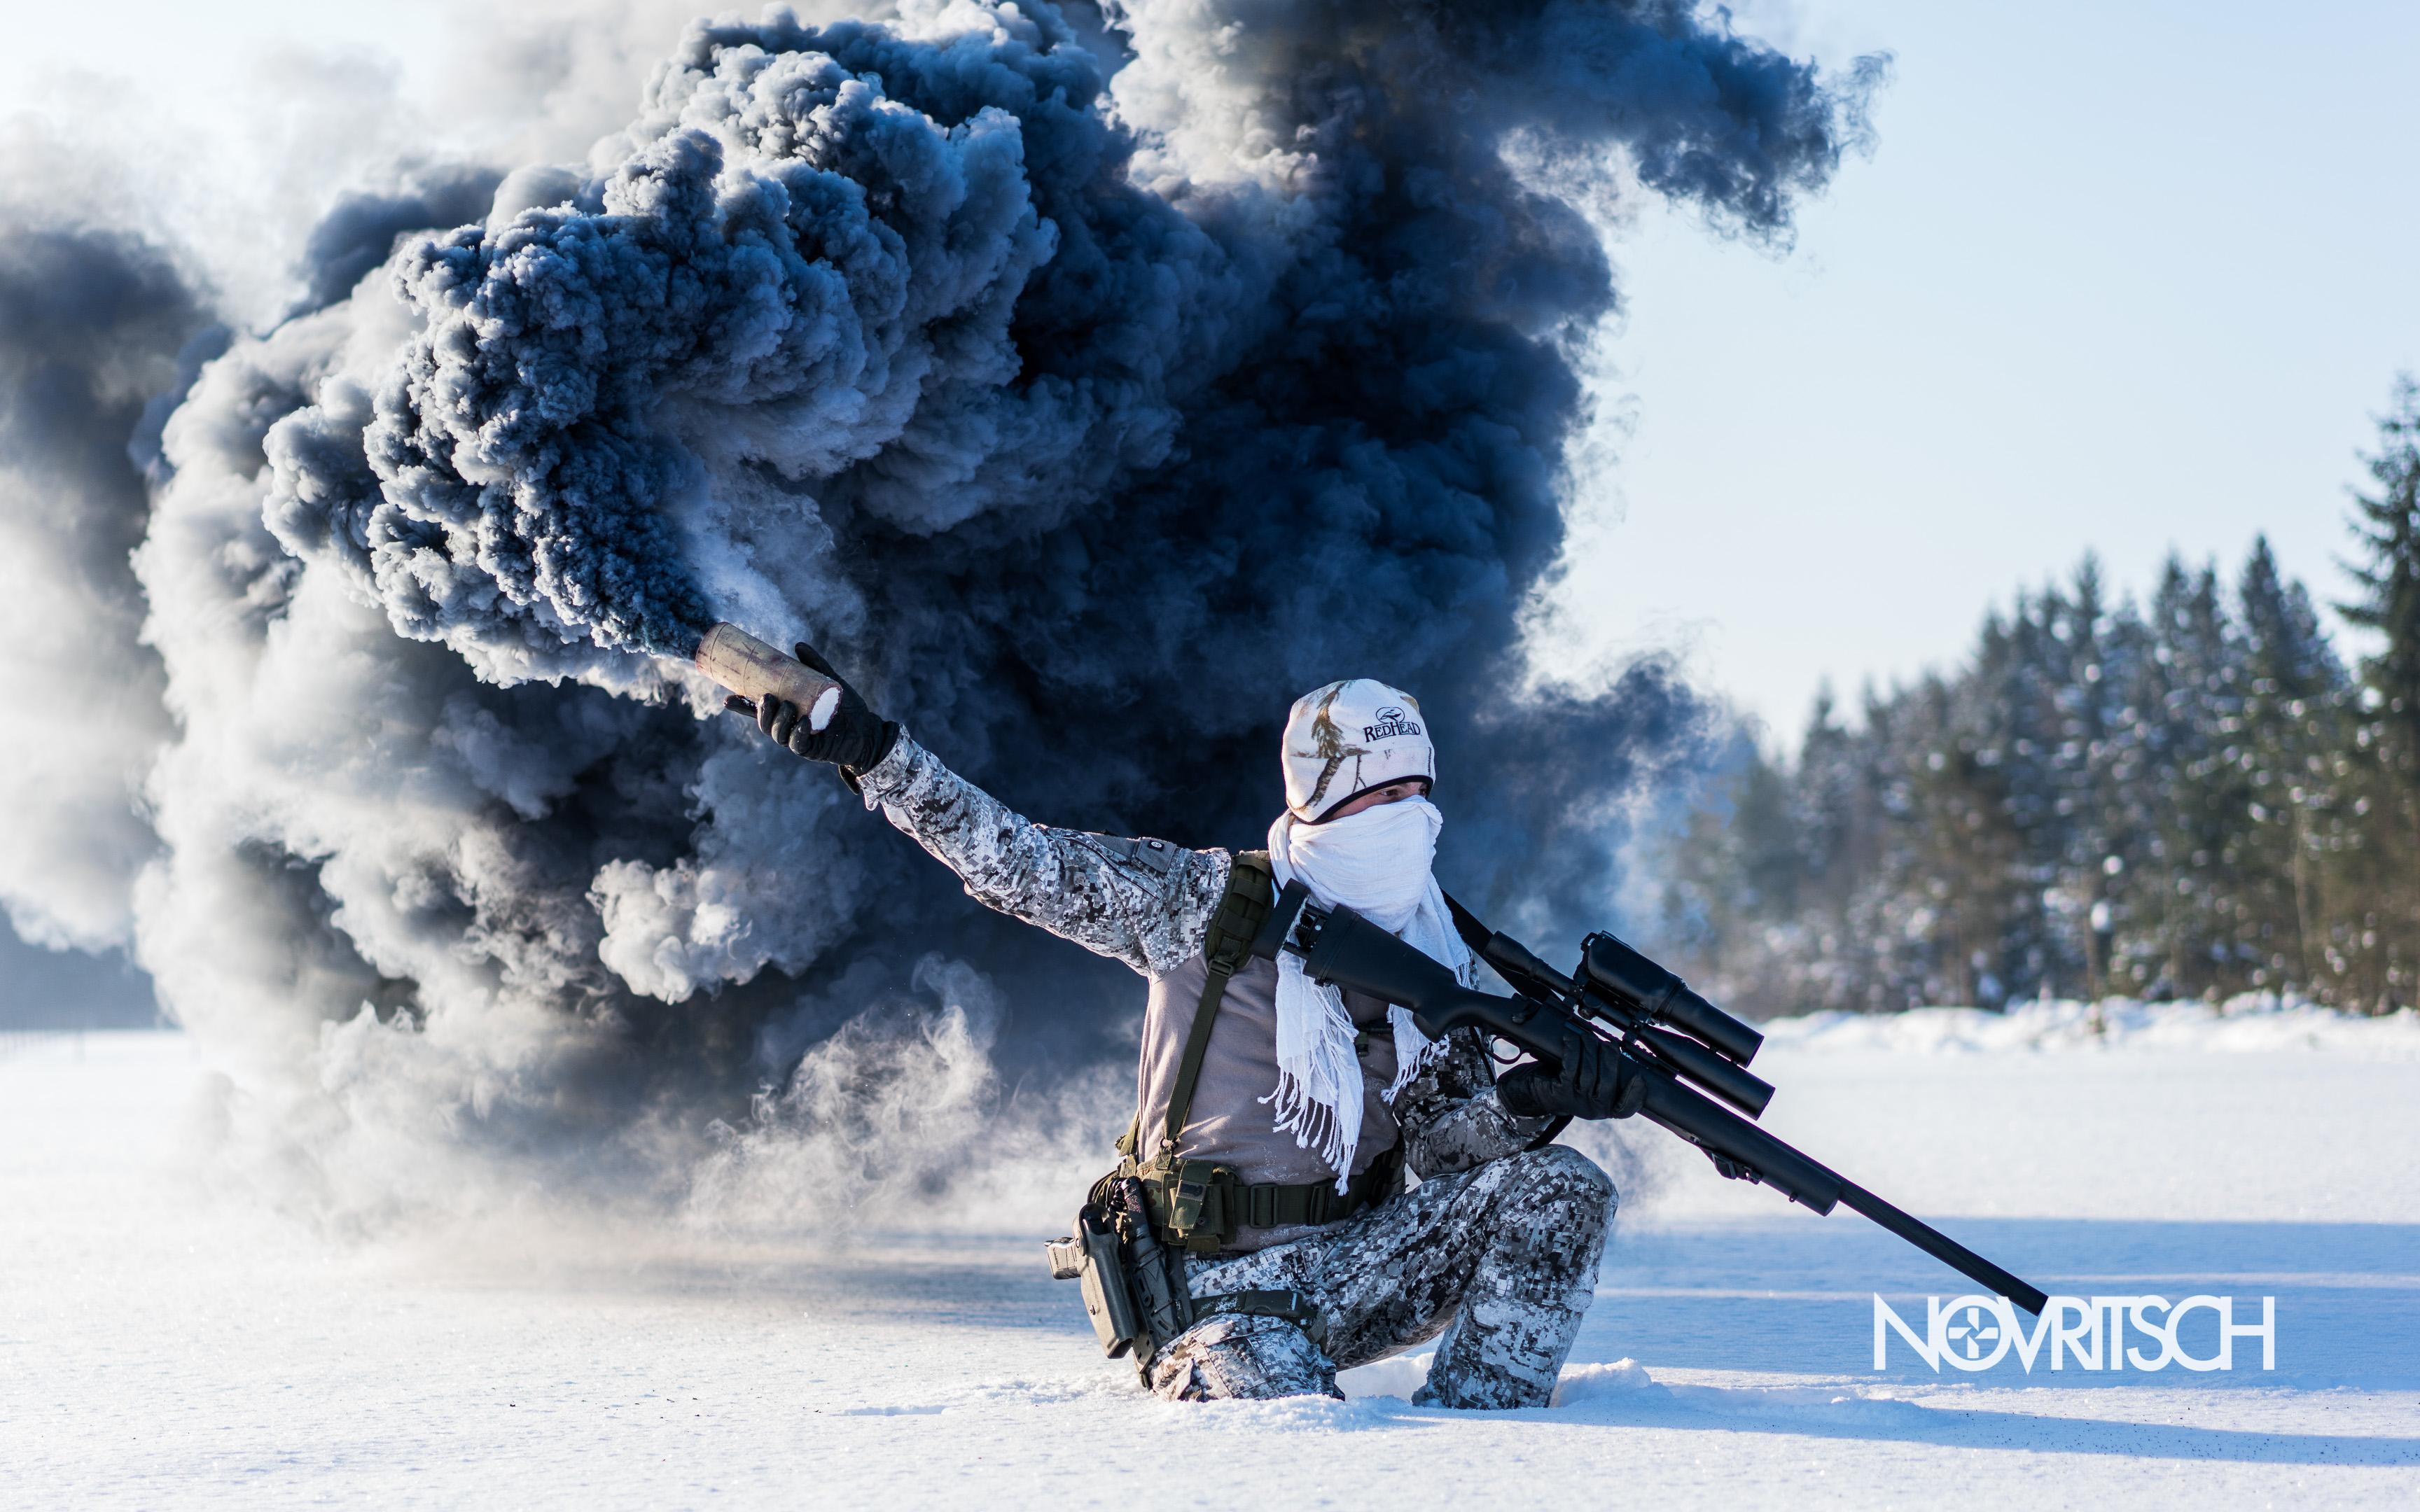 Wallpaper of Airsoft Military Smoke Grenade Sniper Rifle 3456x2160